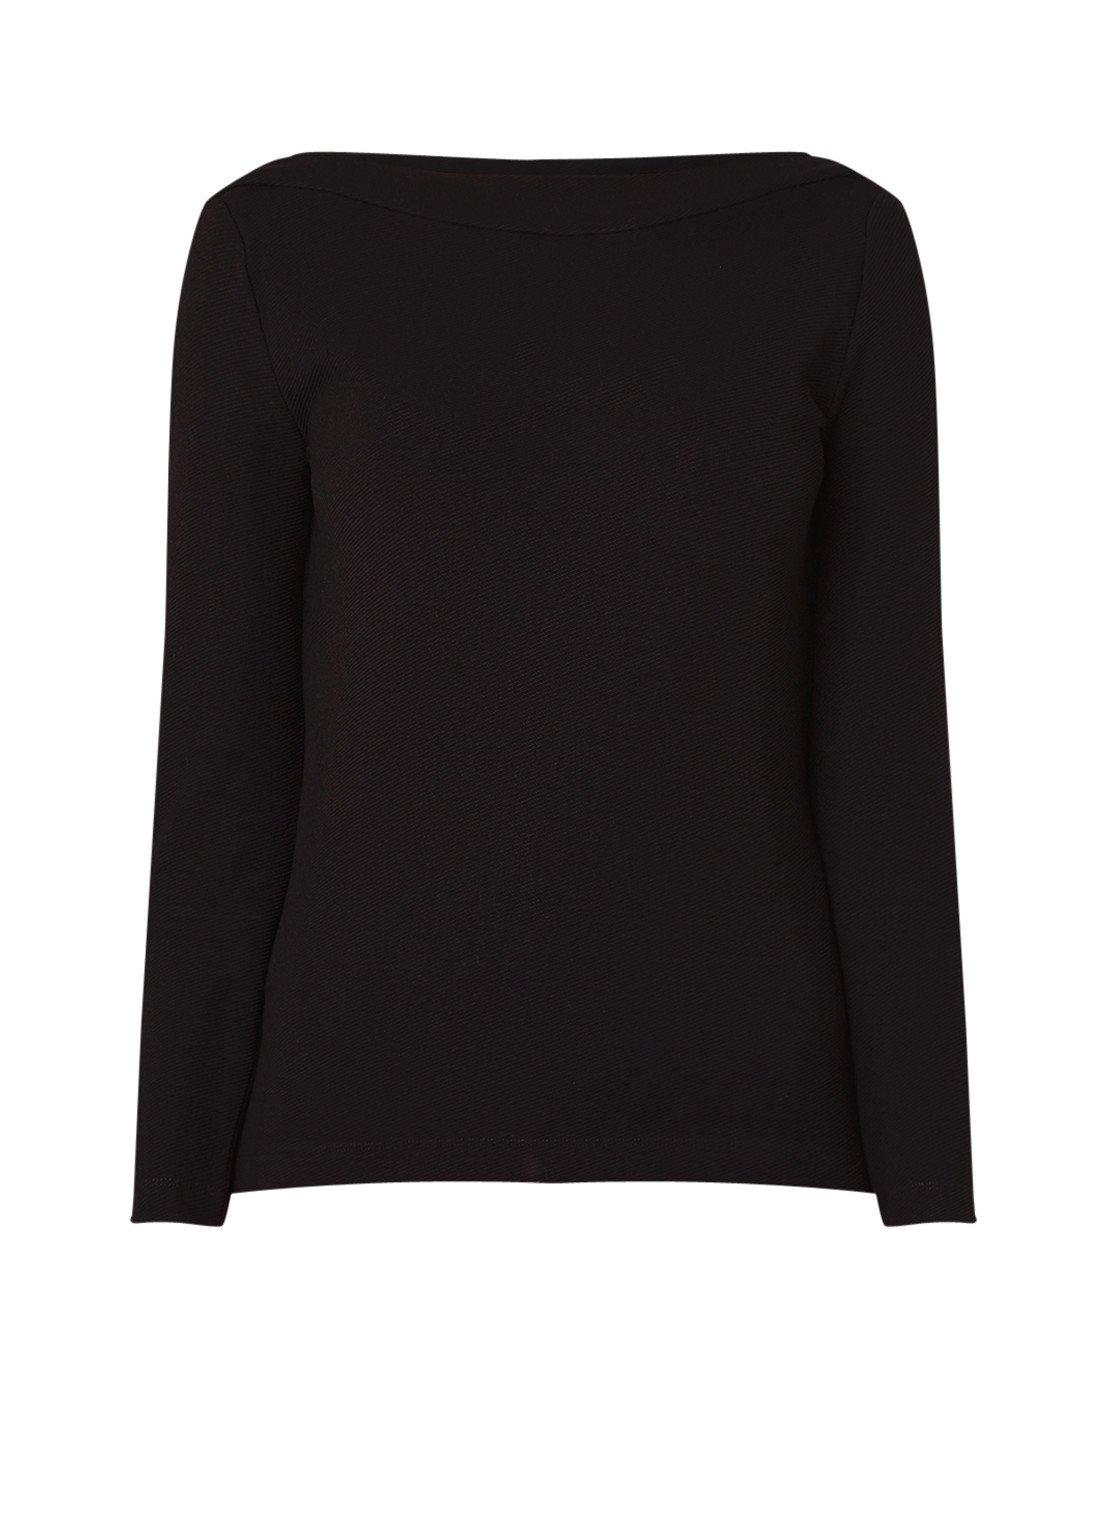 Hedendaags Vanilia kleding online kopen   Fashionchick.nl MG-12